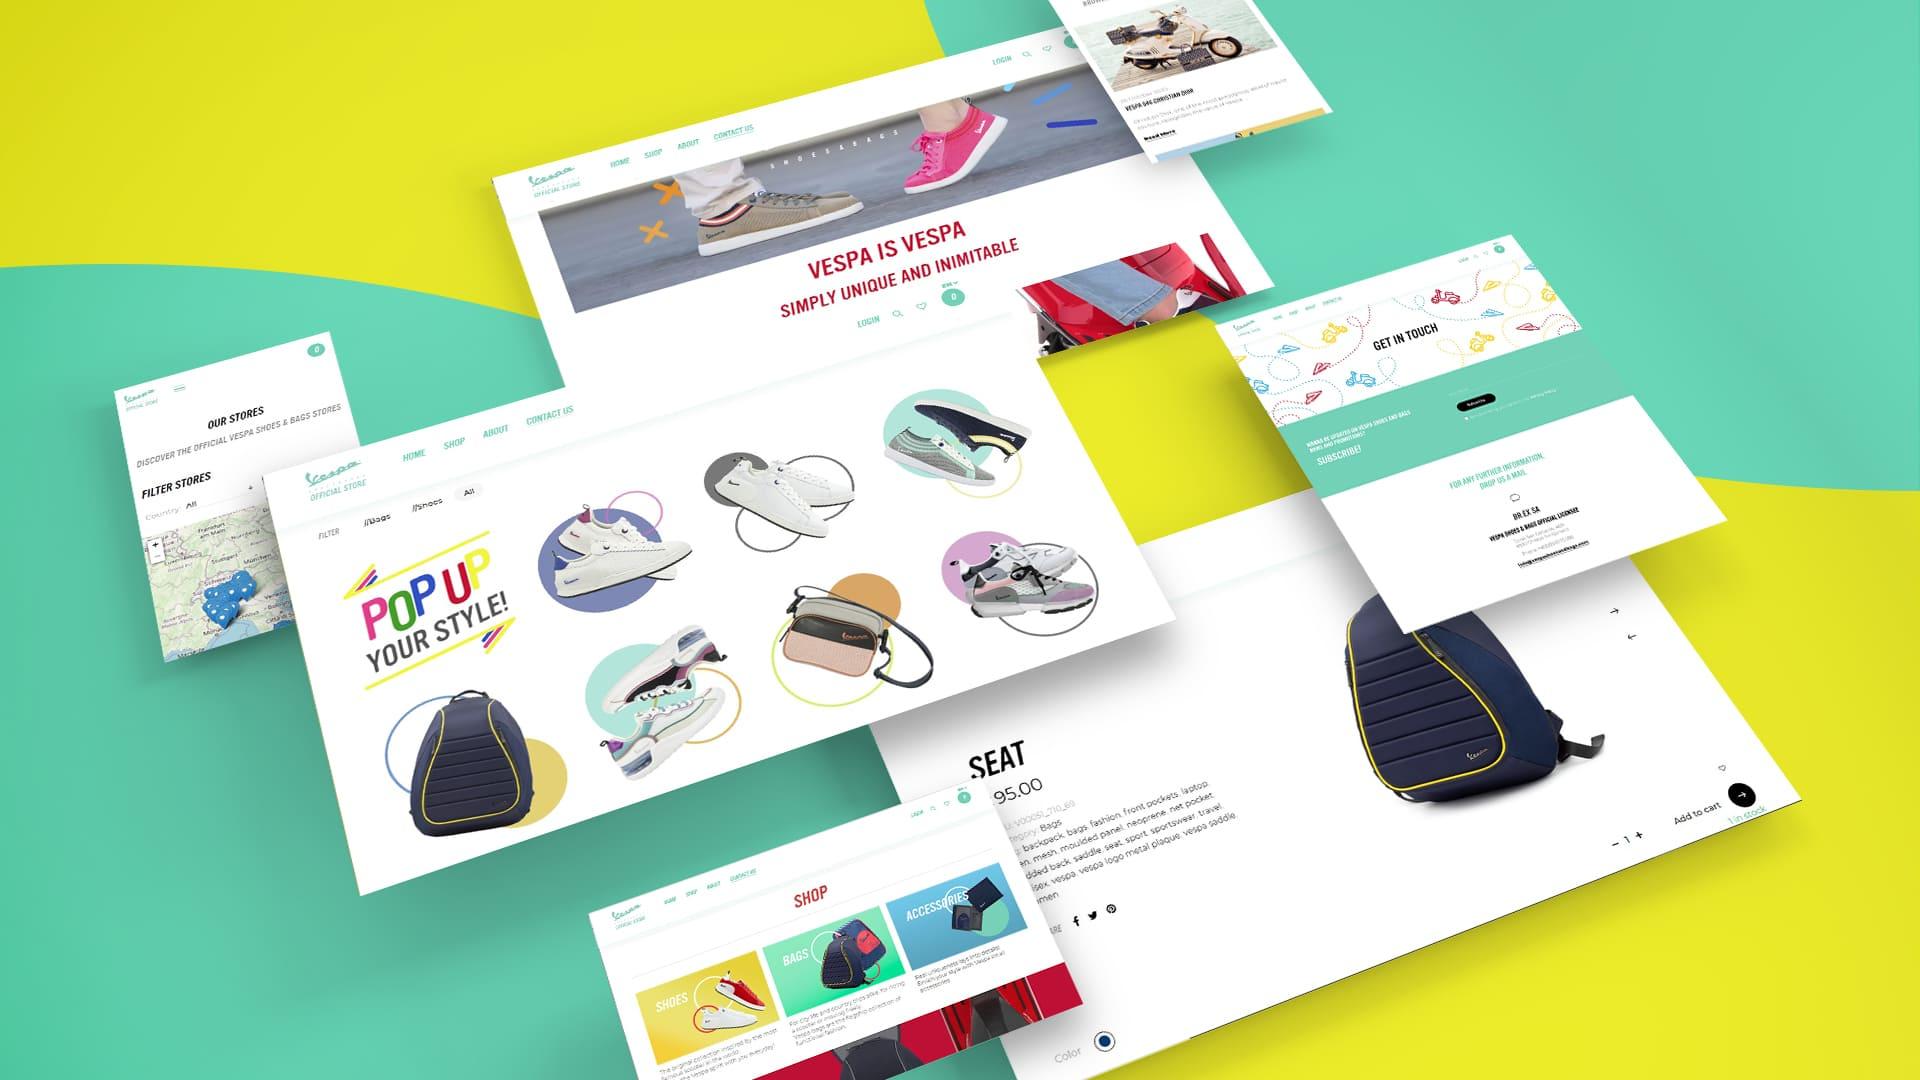 Hubmira Grafica Foto Vespa Shoes Bags Ecommerce Sito Web